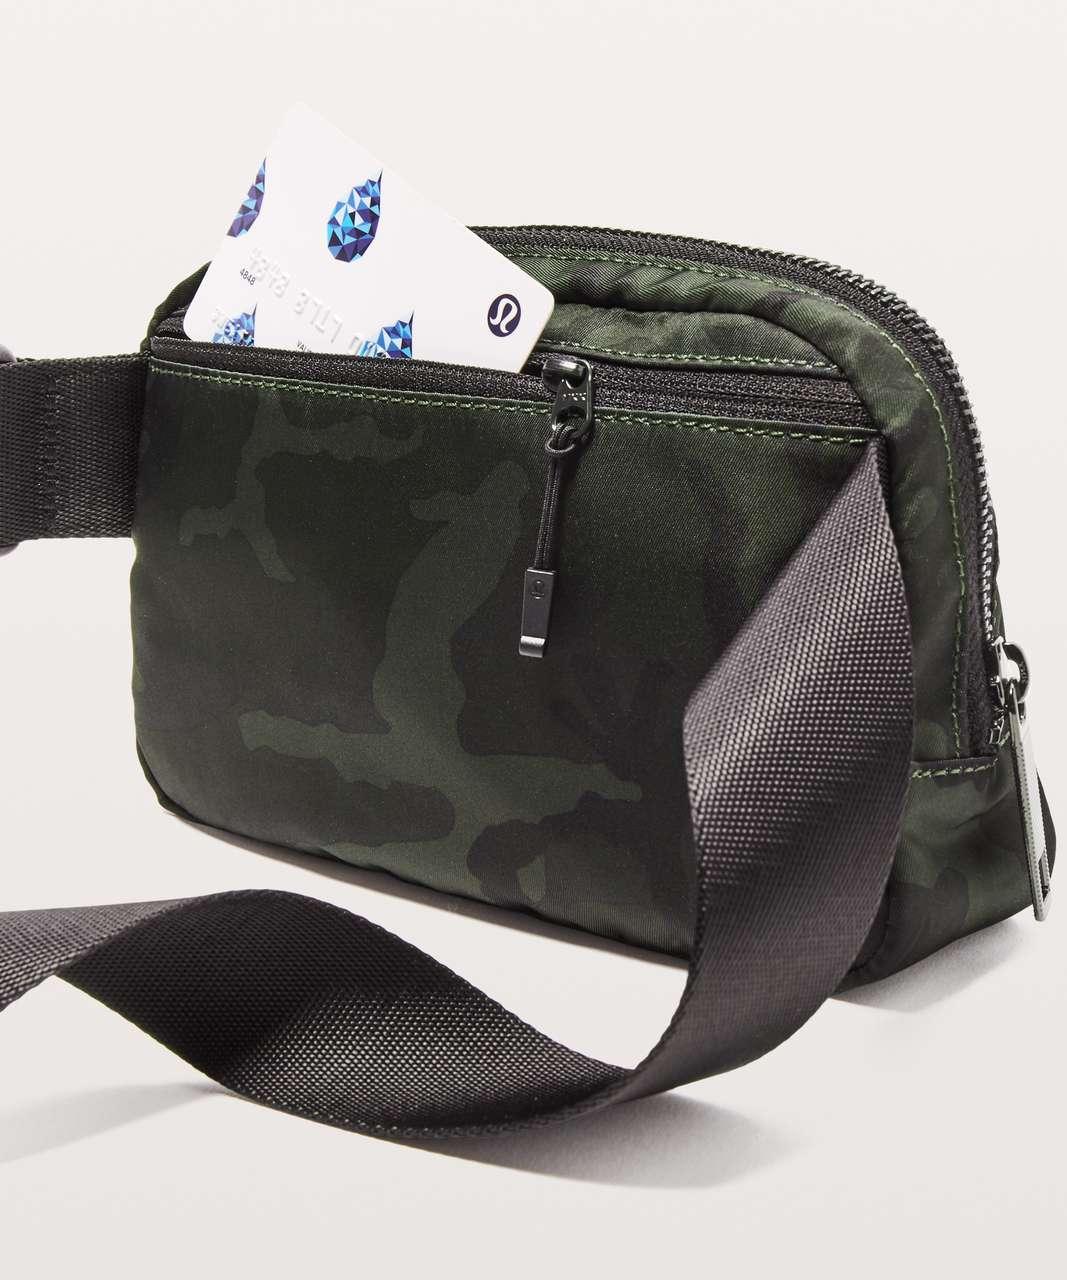 Lululemon Everywhere Belt Bag *1L - Woodland Camo Gator Green Dark Olive / Black